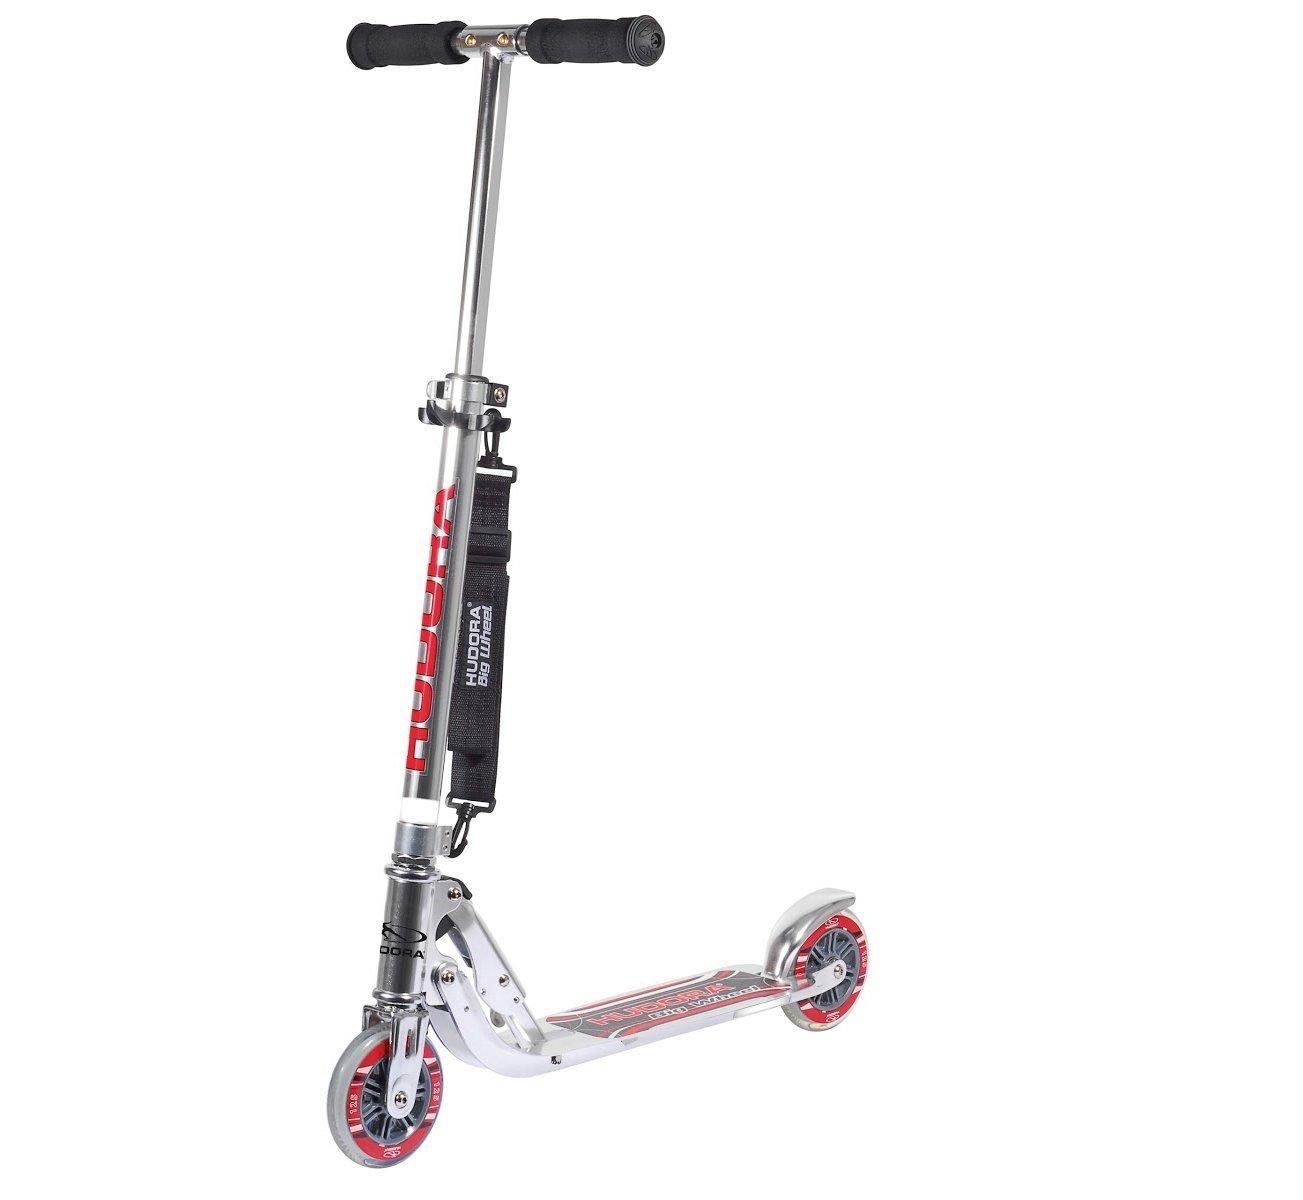 Hudora 14200 Scooter - Scooters (Kids/Adults, Asphalt,, Poliuretano, Aluminio)